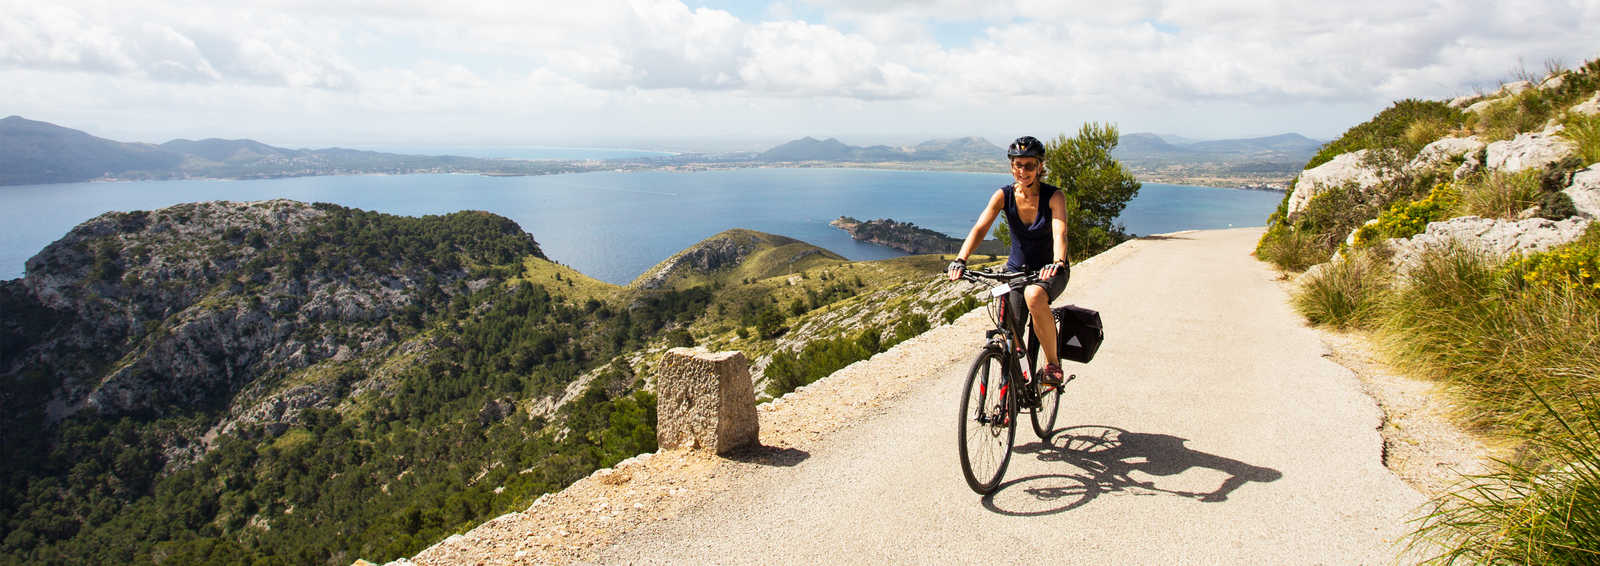 Cycling towards the Talaia d'Albercutx